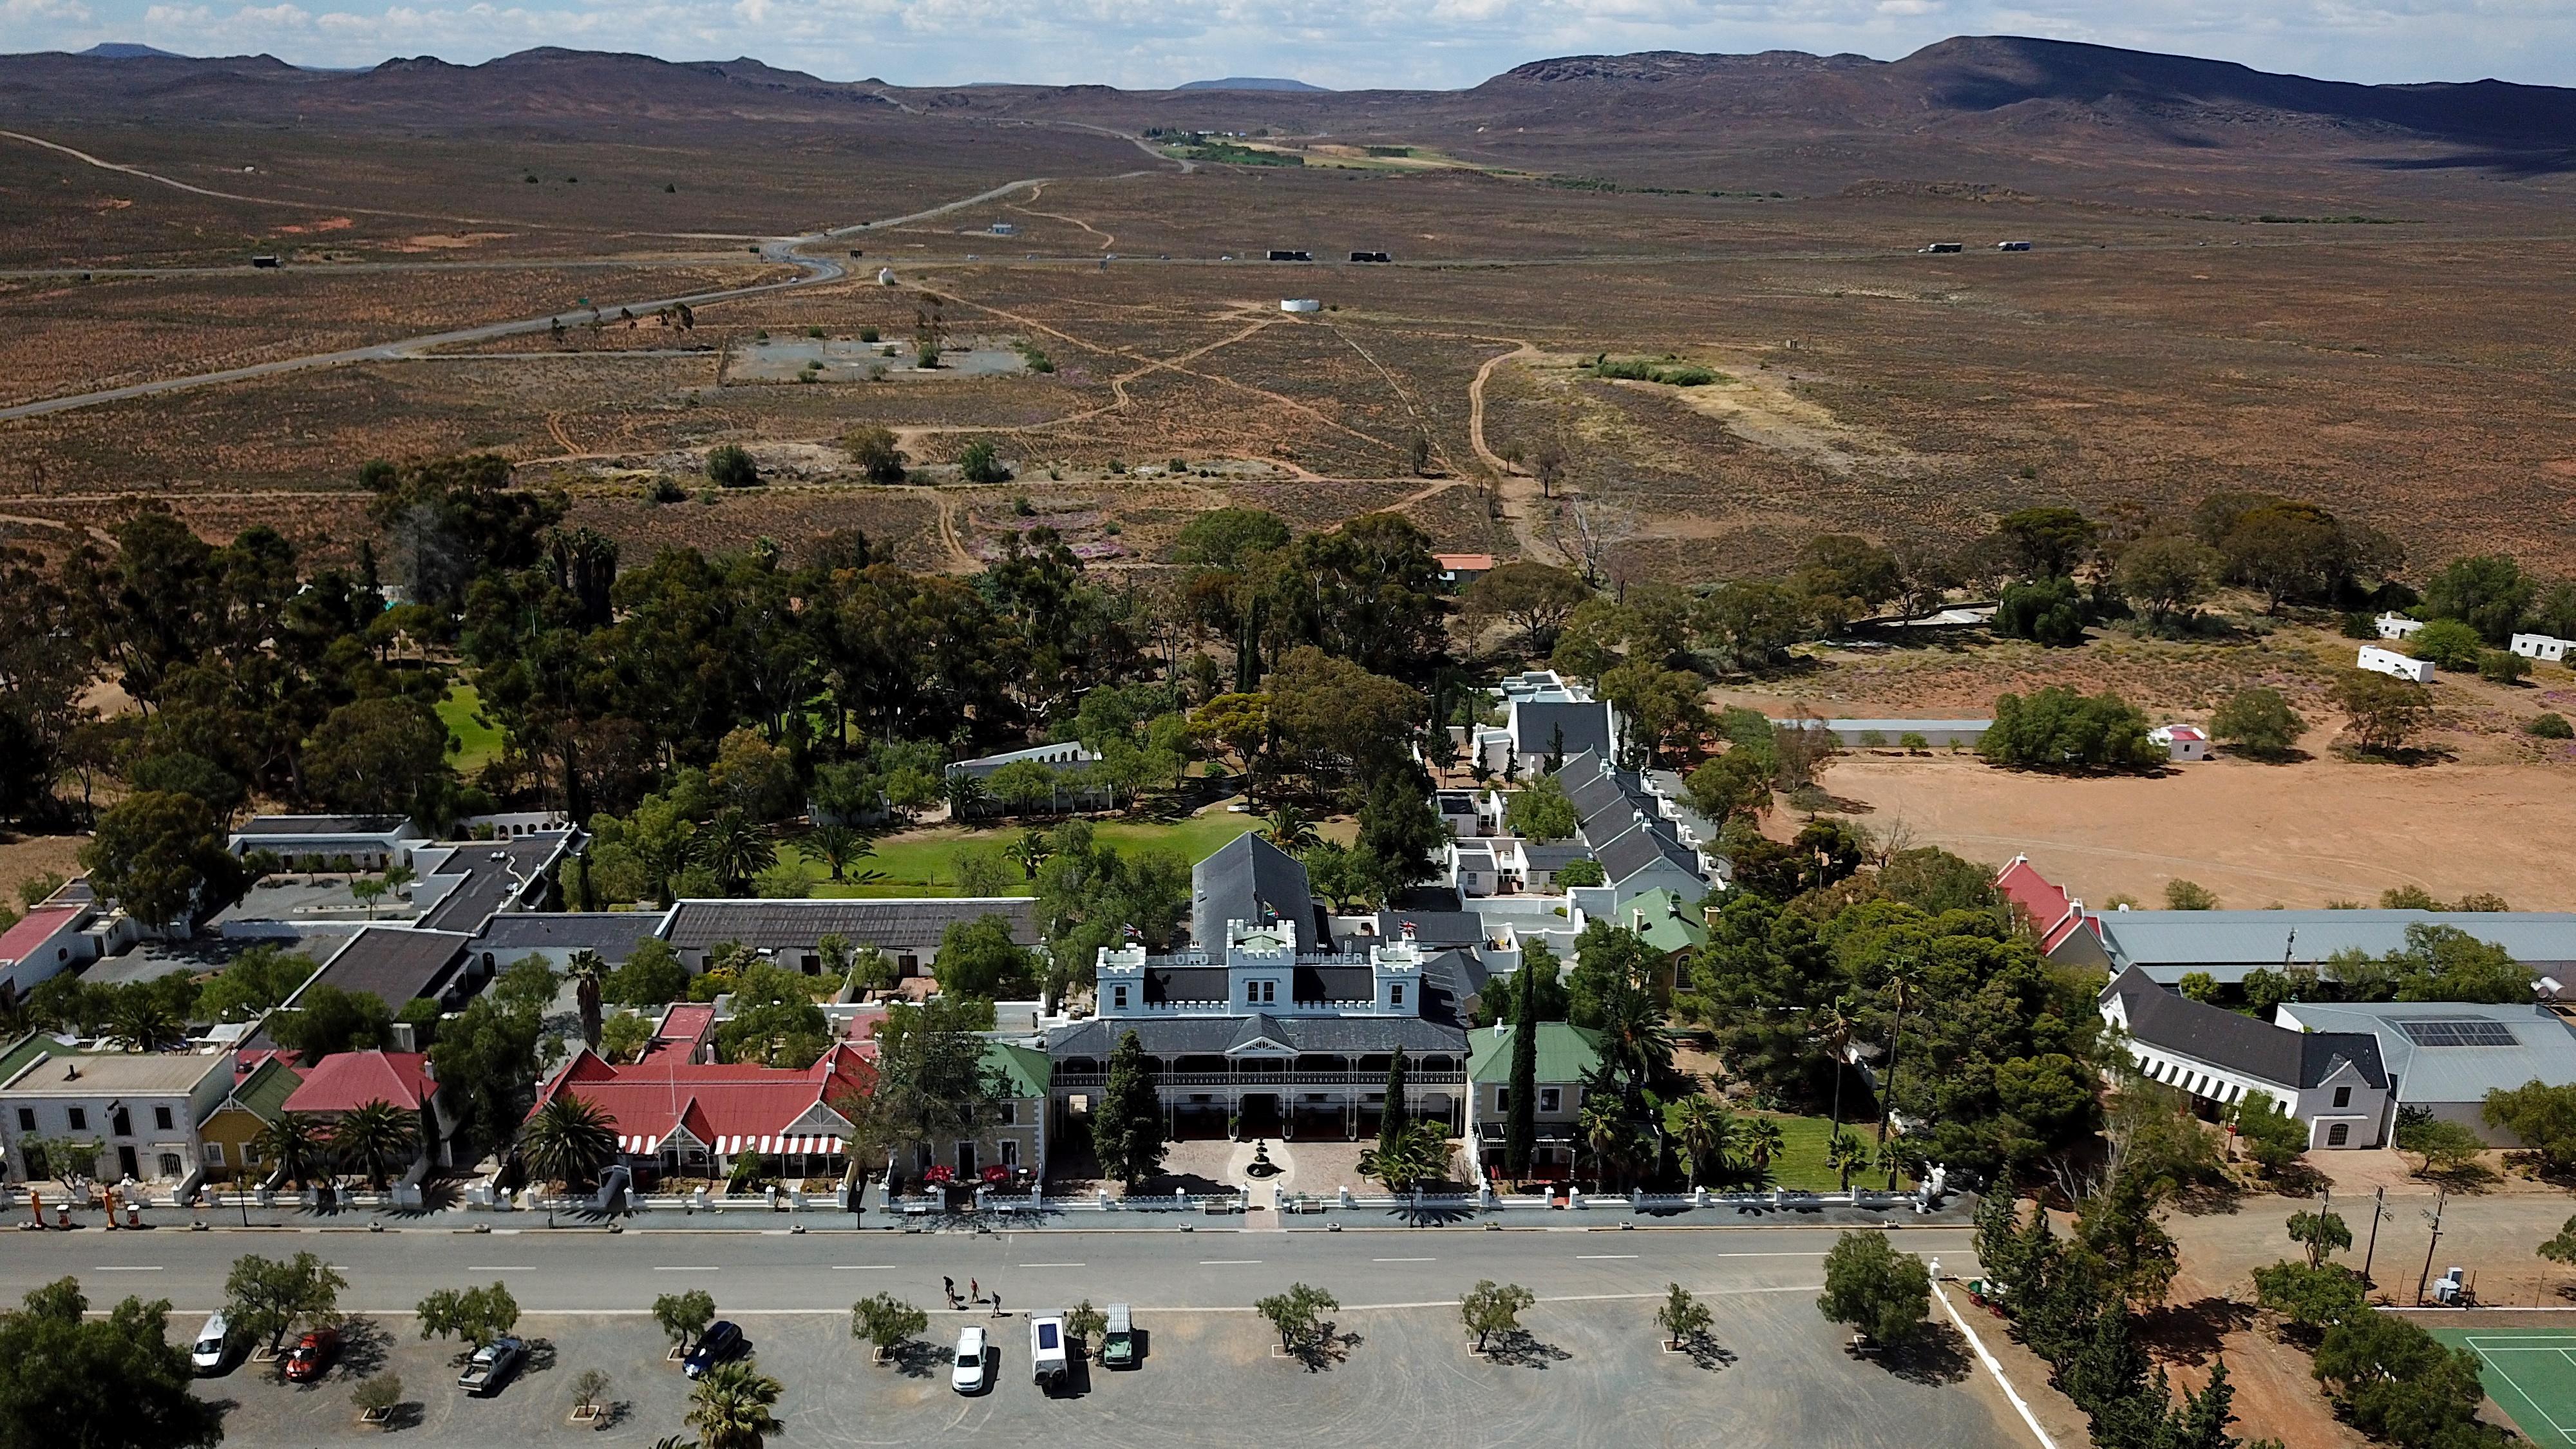 majtjiesfontein town.jpg